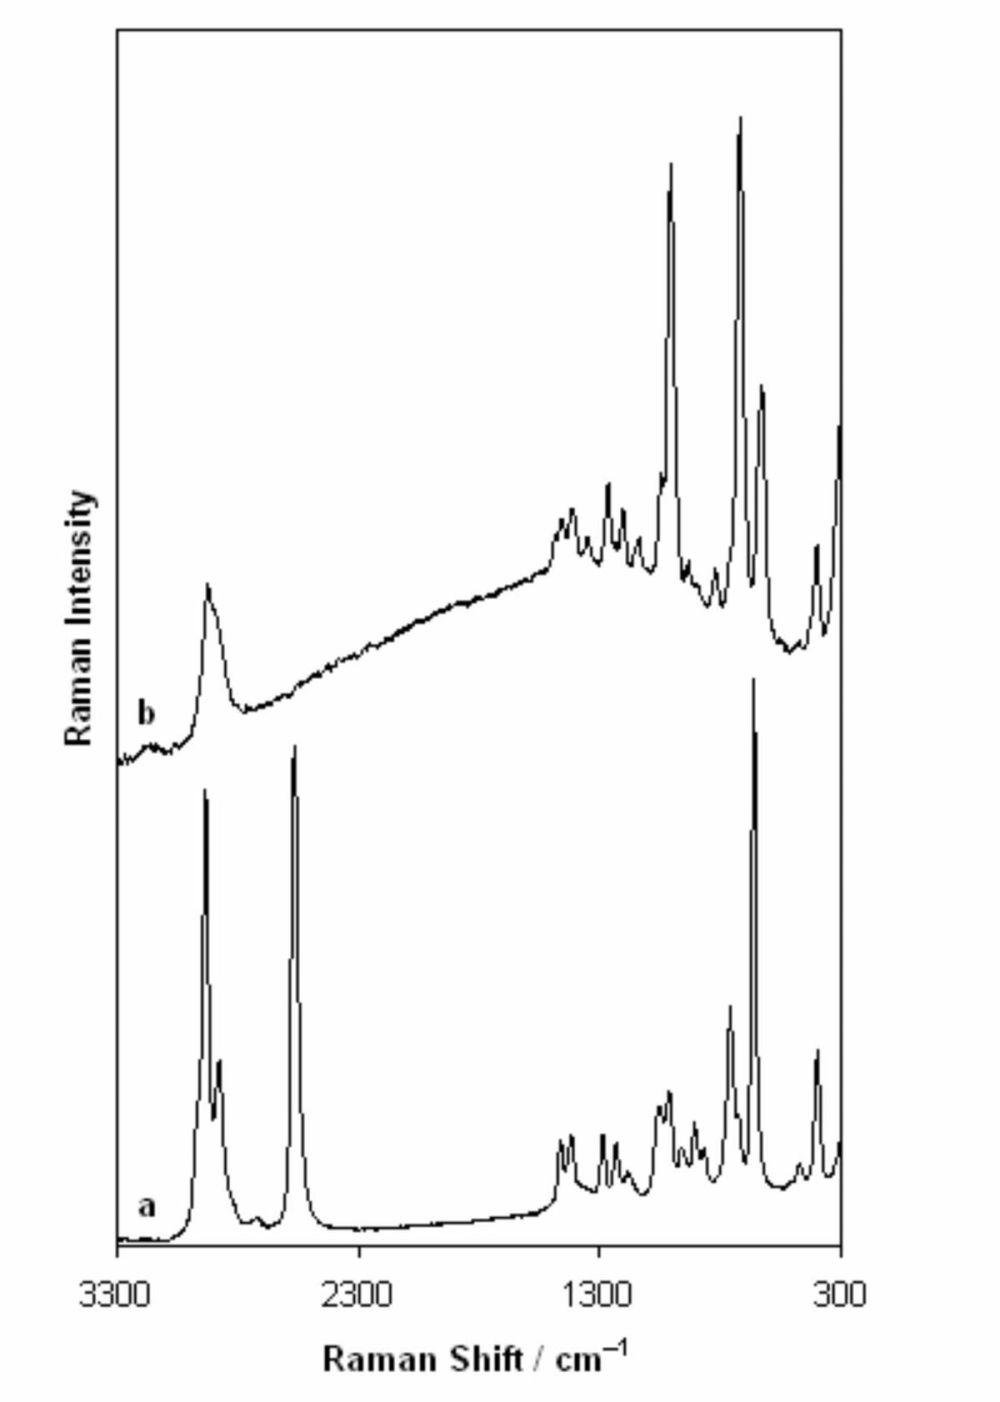 medium resolution of wiring diagram 2003 kium spectra g